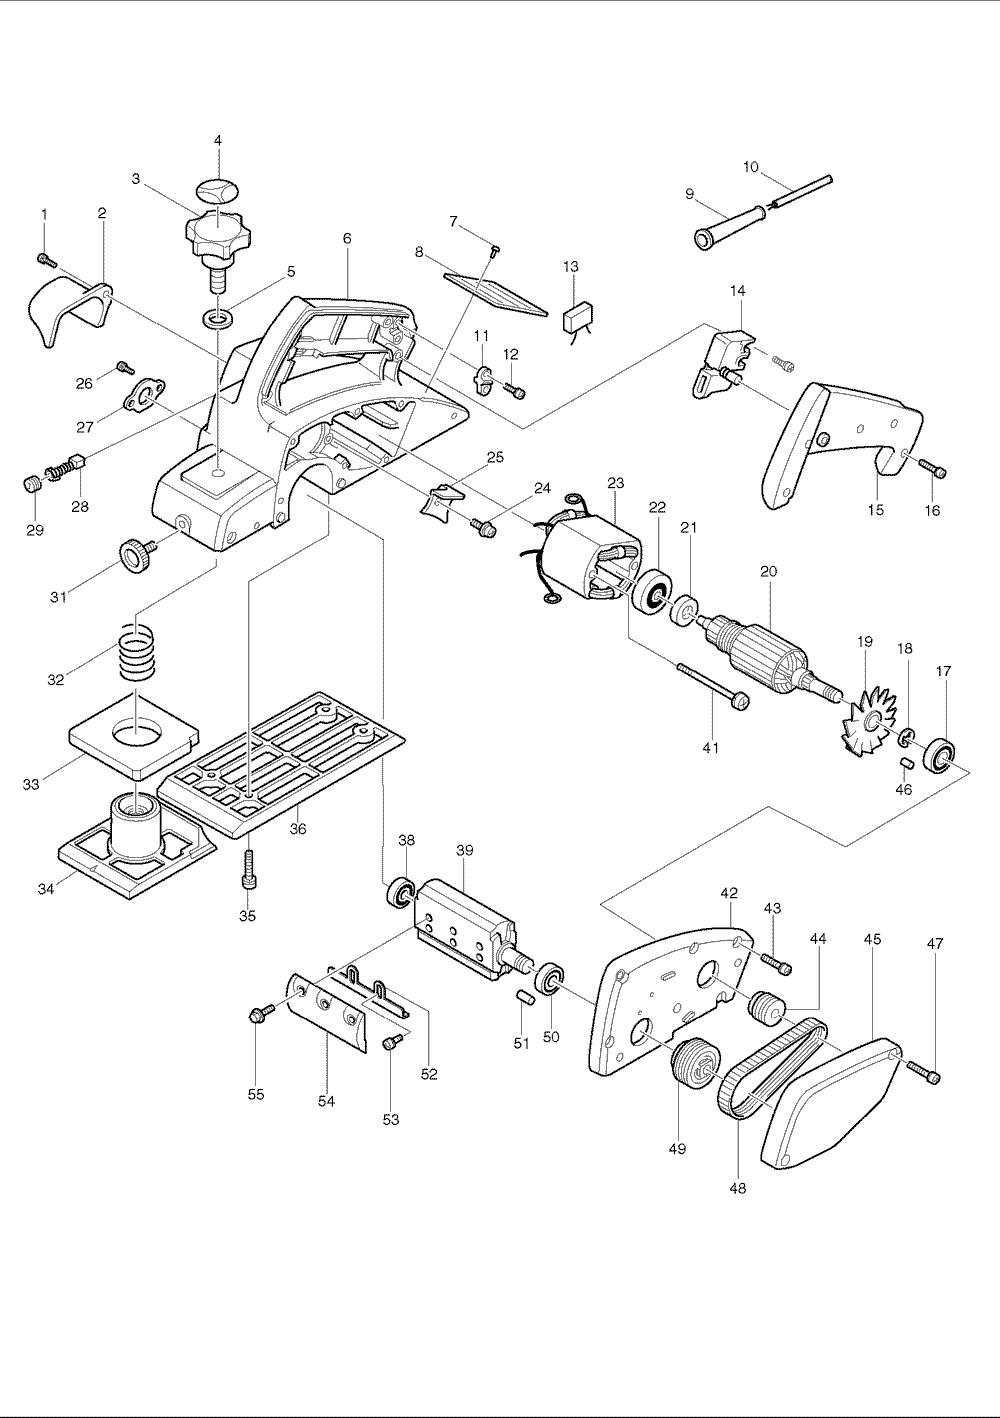 Jet Shaper Wiring Diagram Jeep Jk Hardtop Wiring Harness